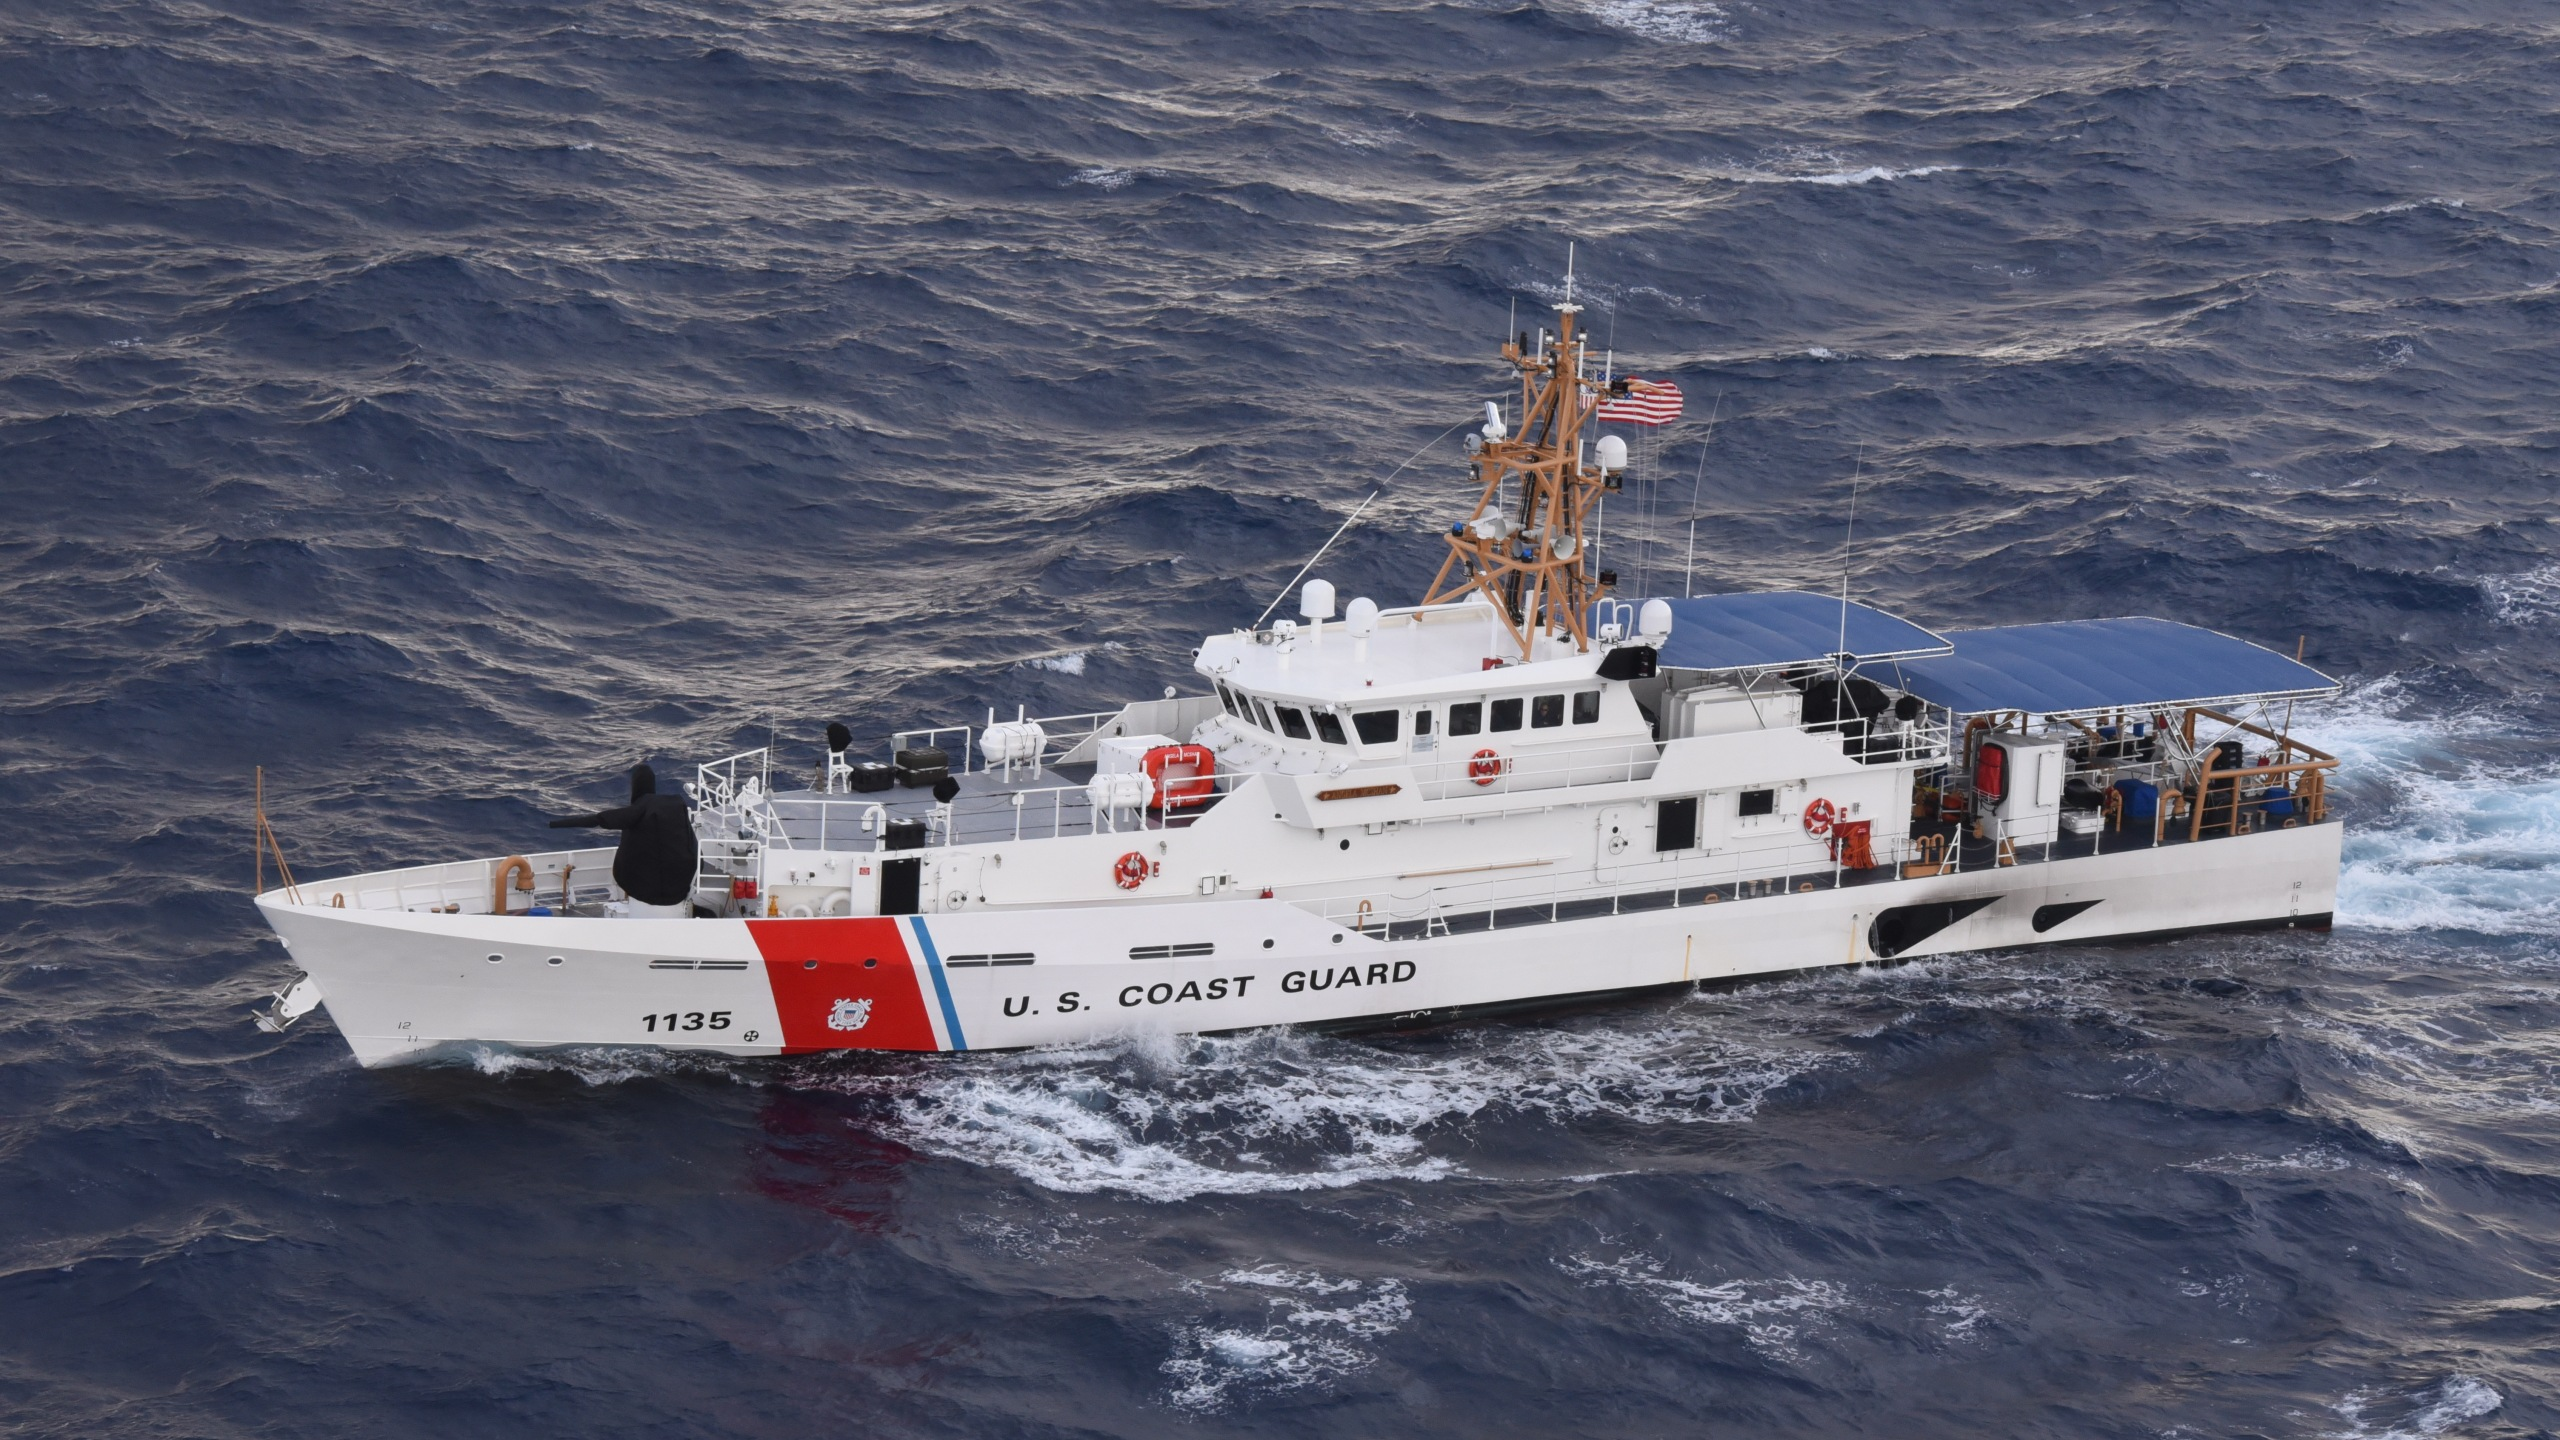 Coast Guard Brings Haul Of Seized Cocaine To San Diego